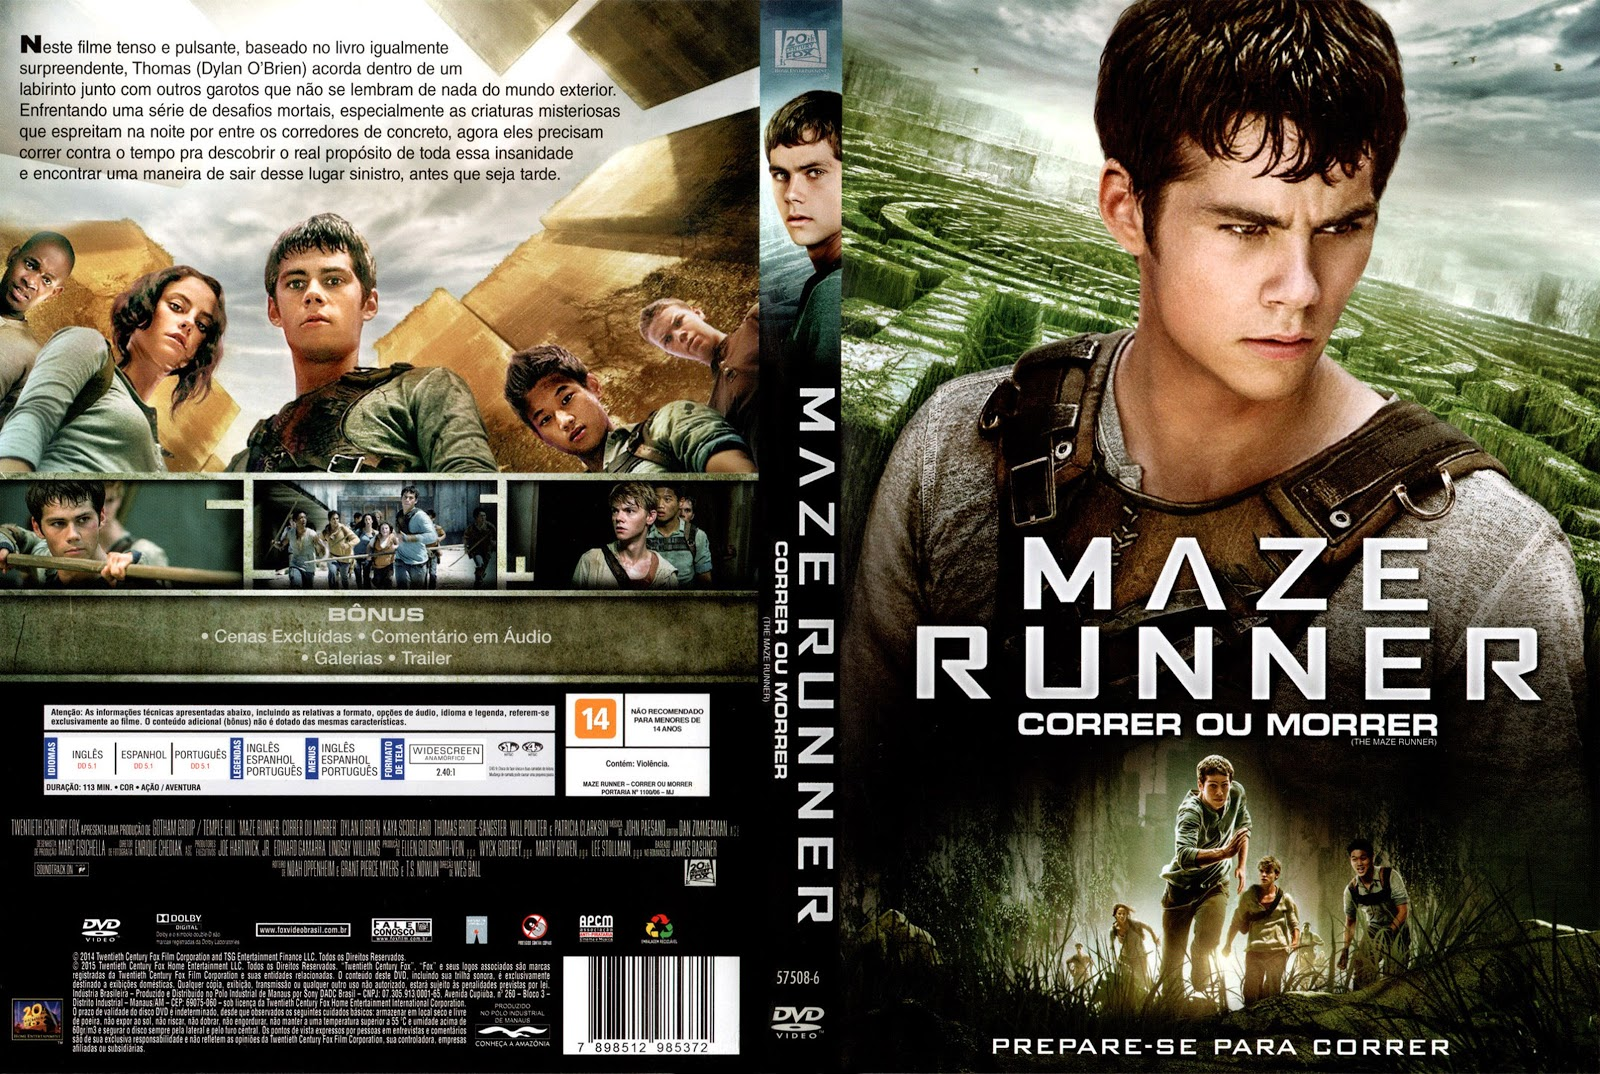 Capa DVD Maze Runner Correr Ou Morrer